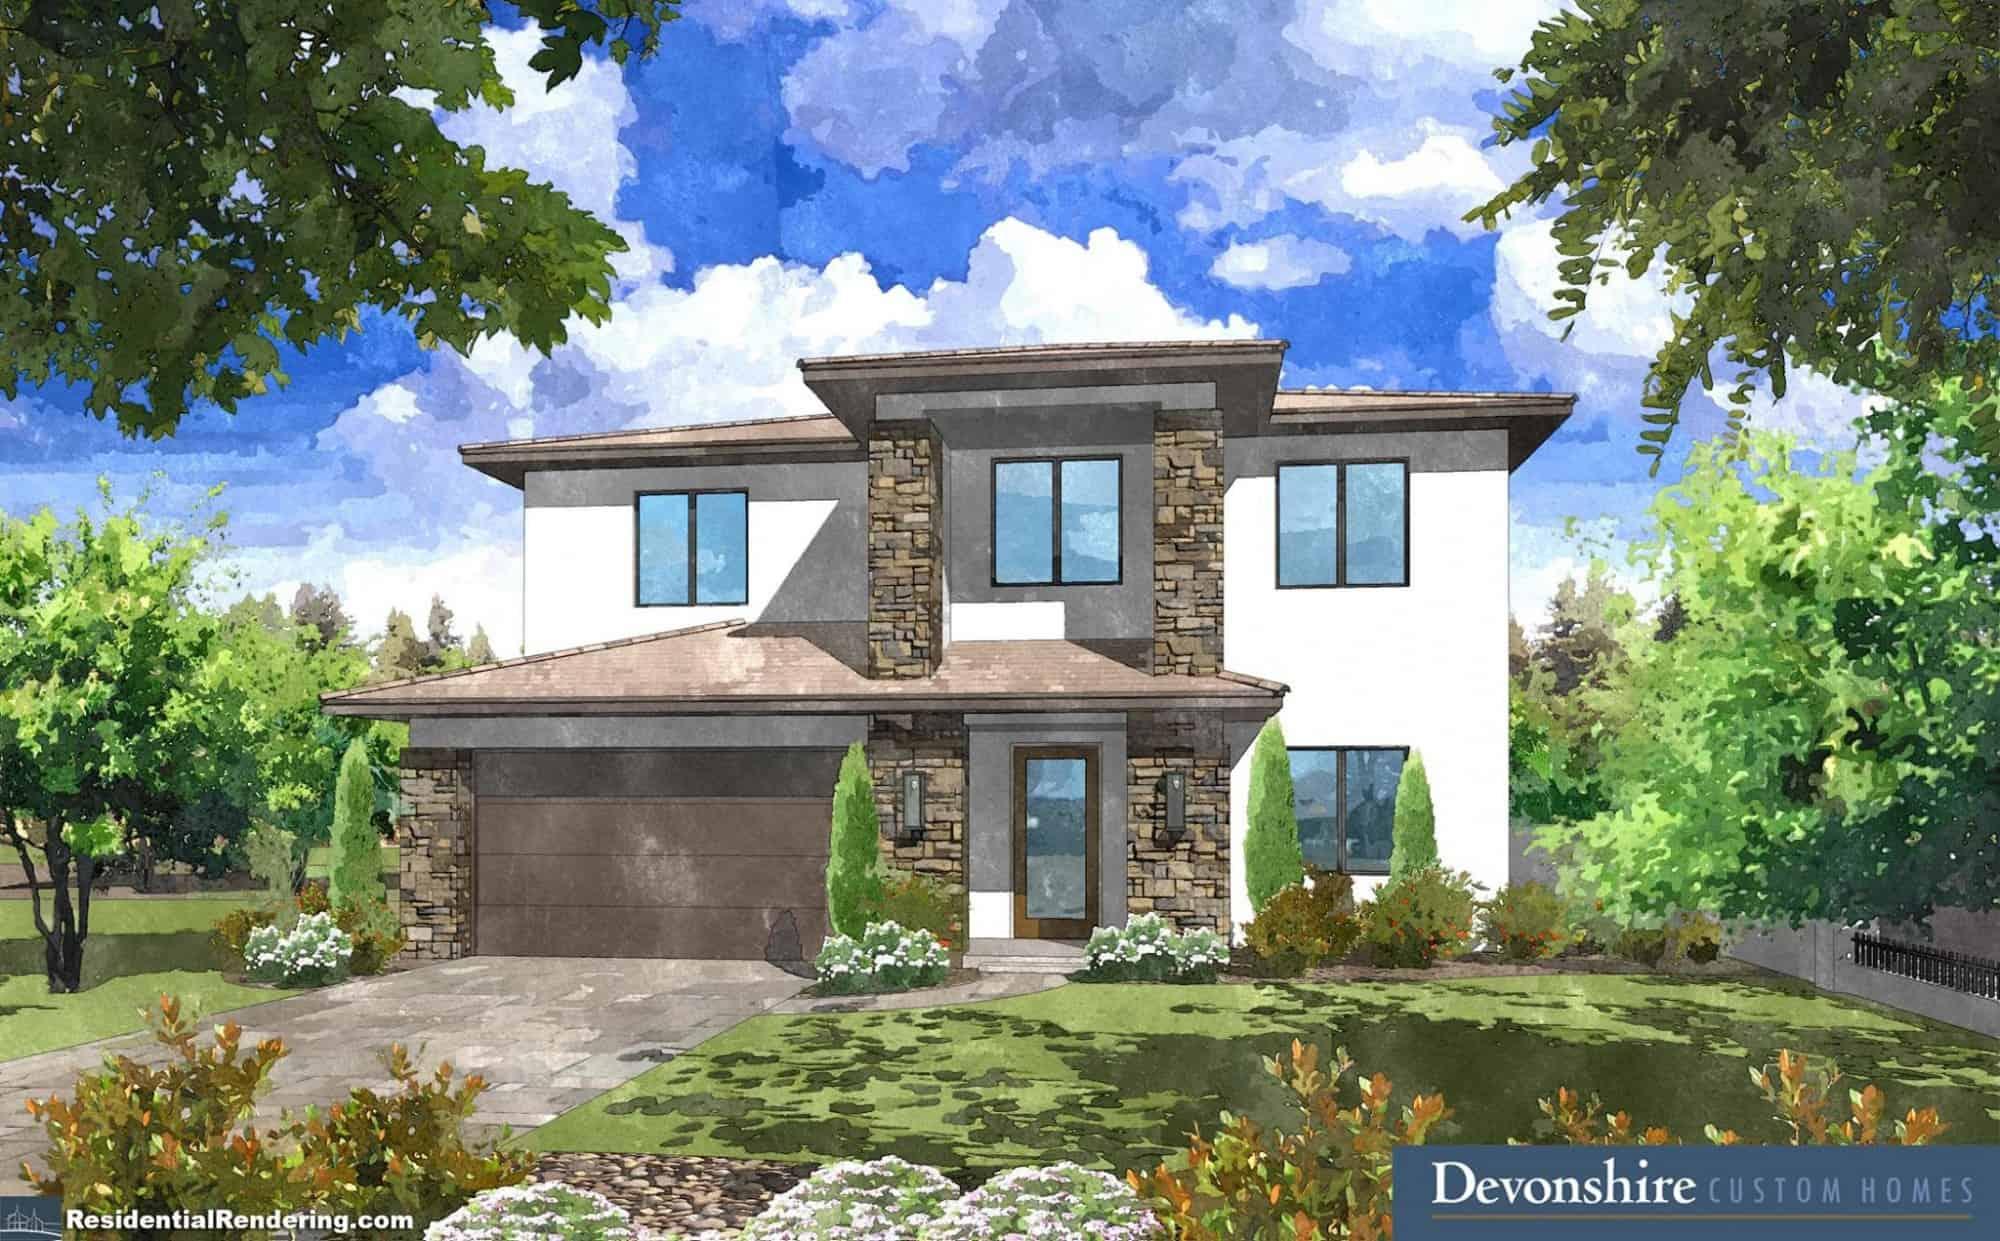 Custom Homes Builder vs. Production Home Builder. Who Should You Choose?